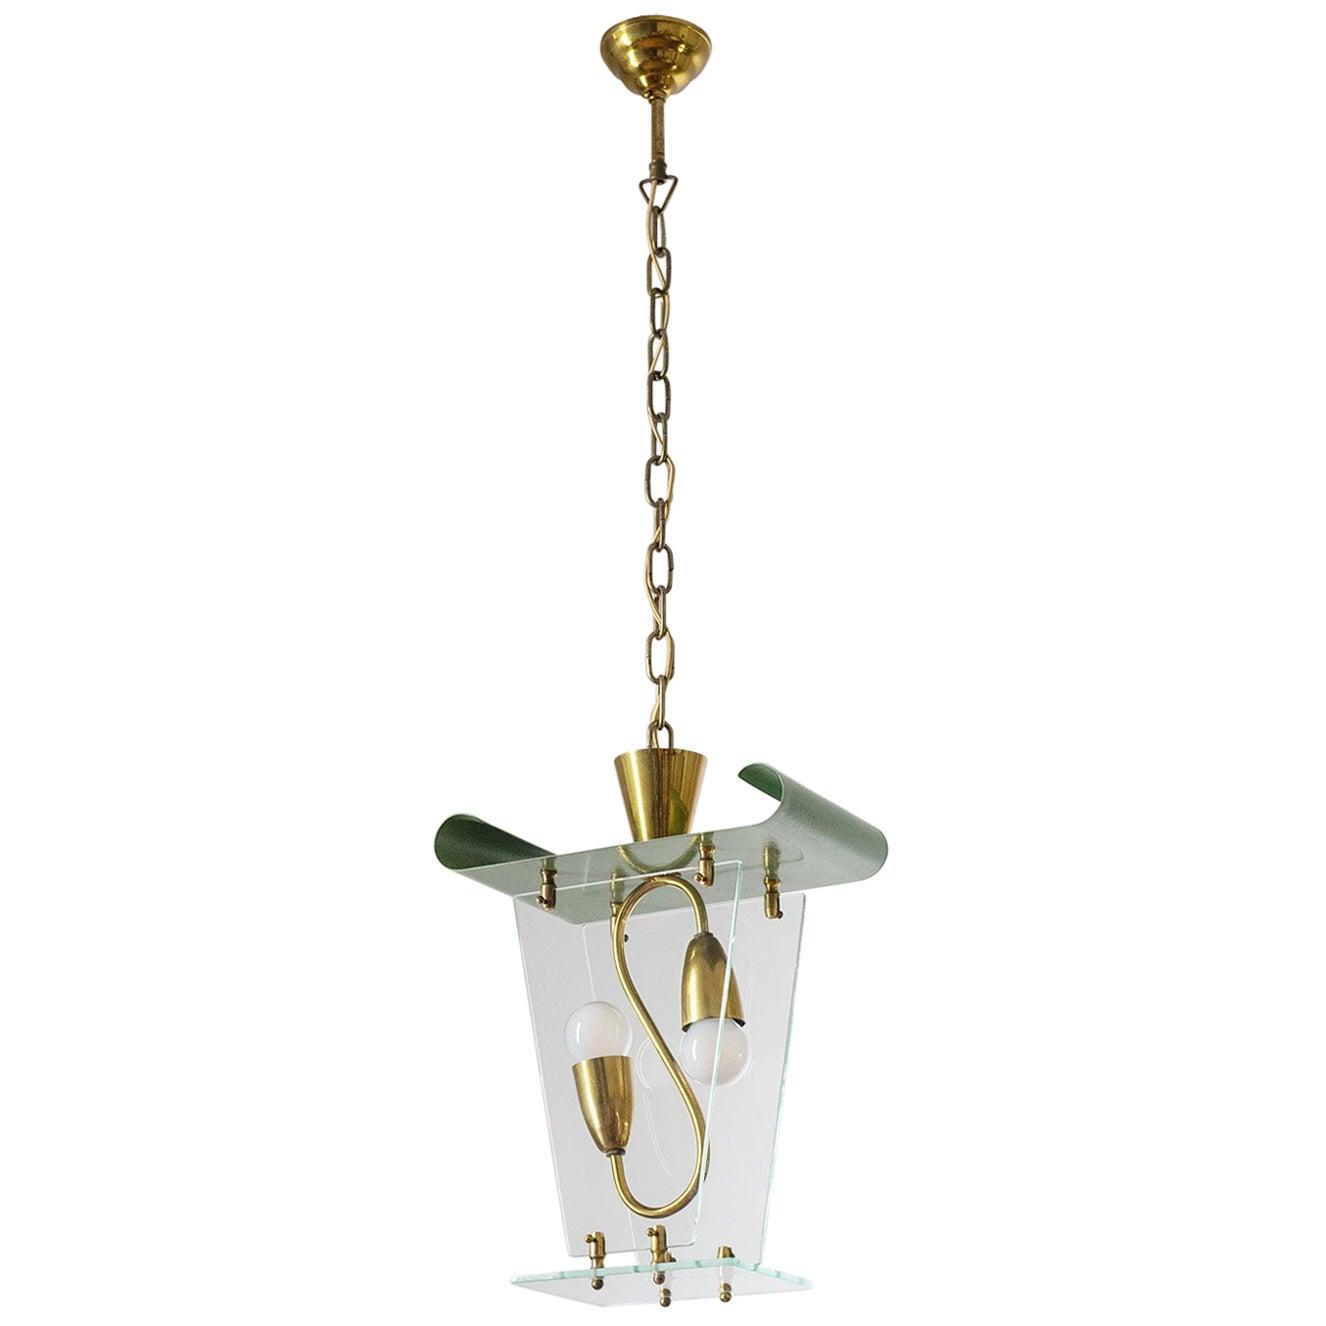 Italian Lantern, 1940s, Brass and Glass